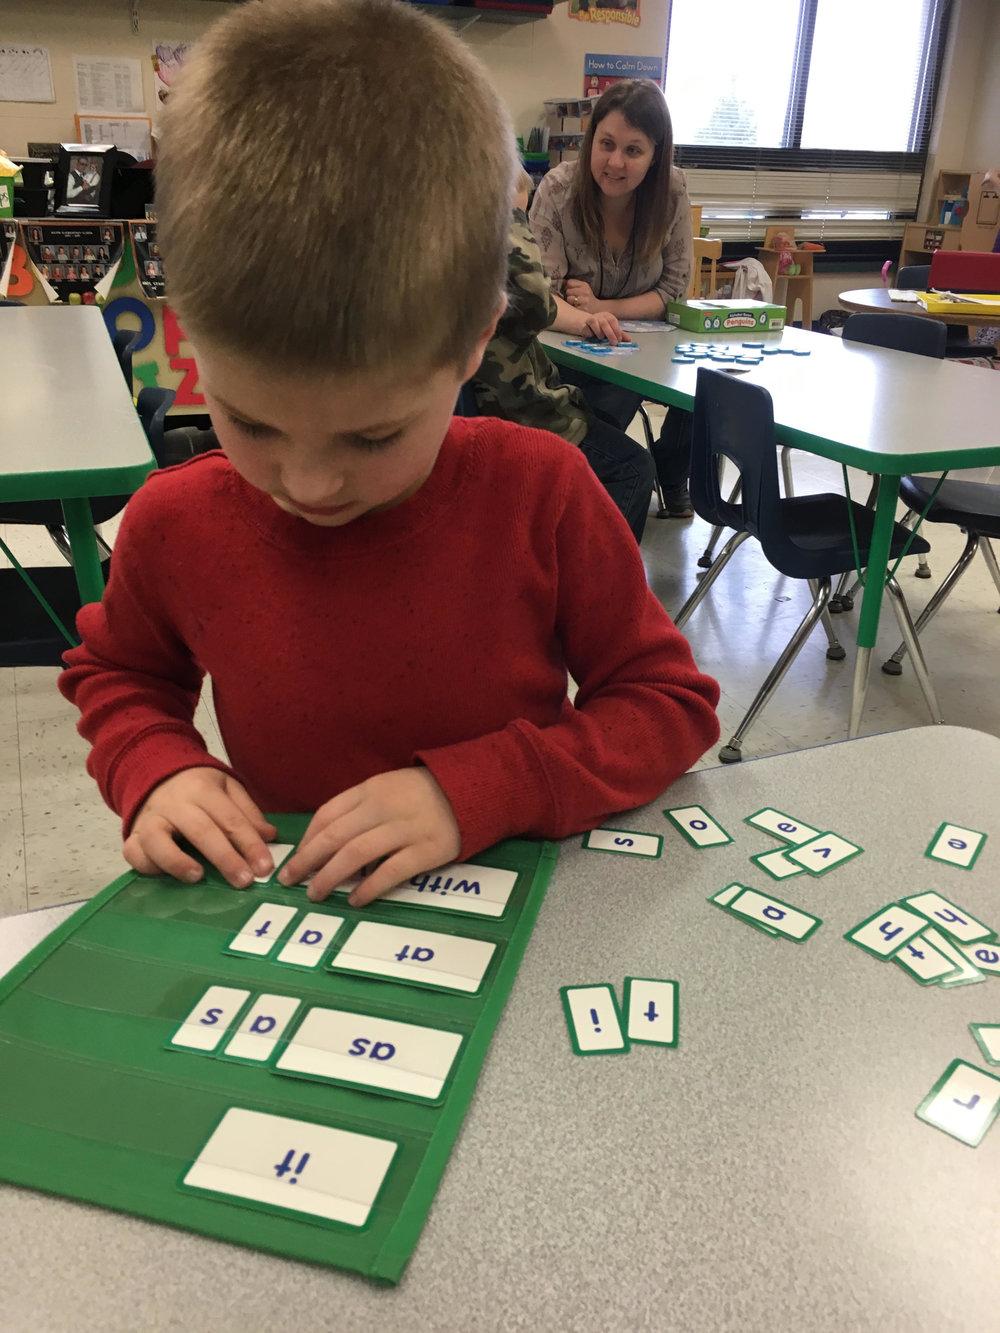 Working on beginning sight word skills!